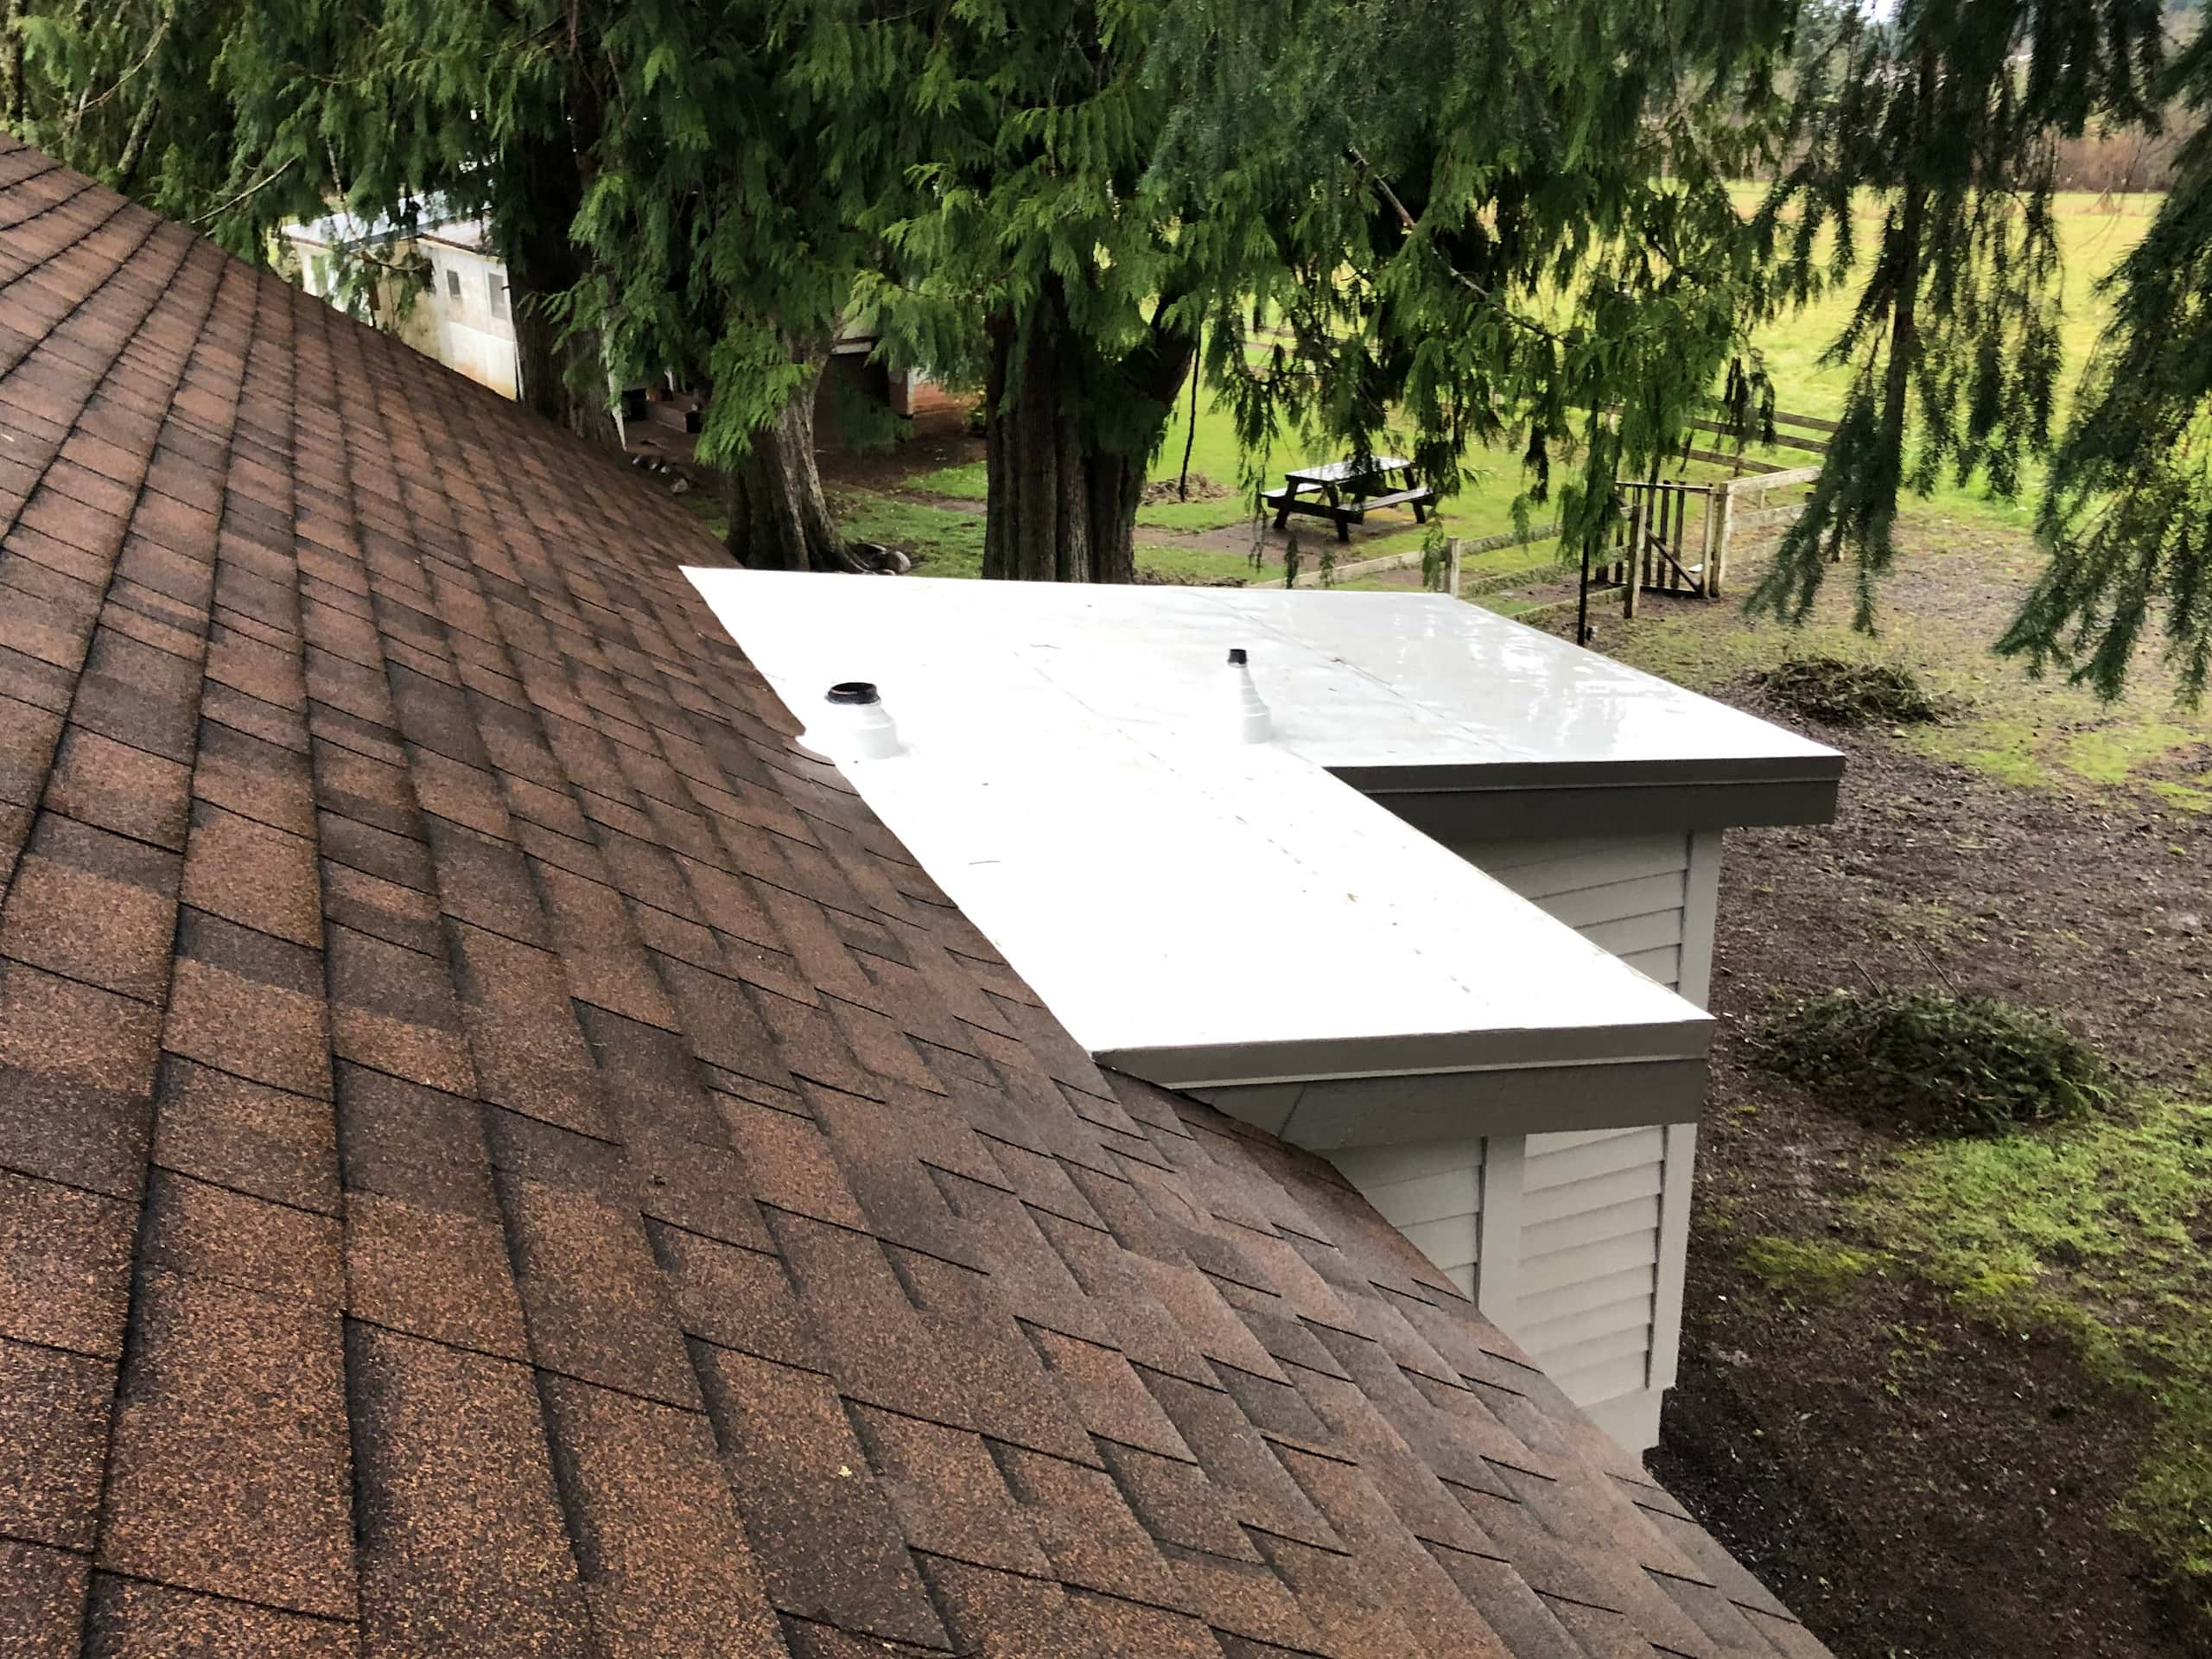 Reliance Roof Pros LLC | Lake Oswego | New Roof | Malarkey Vista AR | Antique Brown | Vents